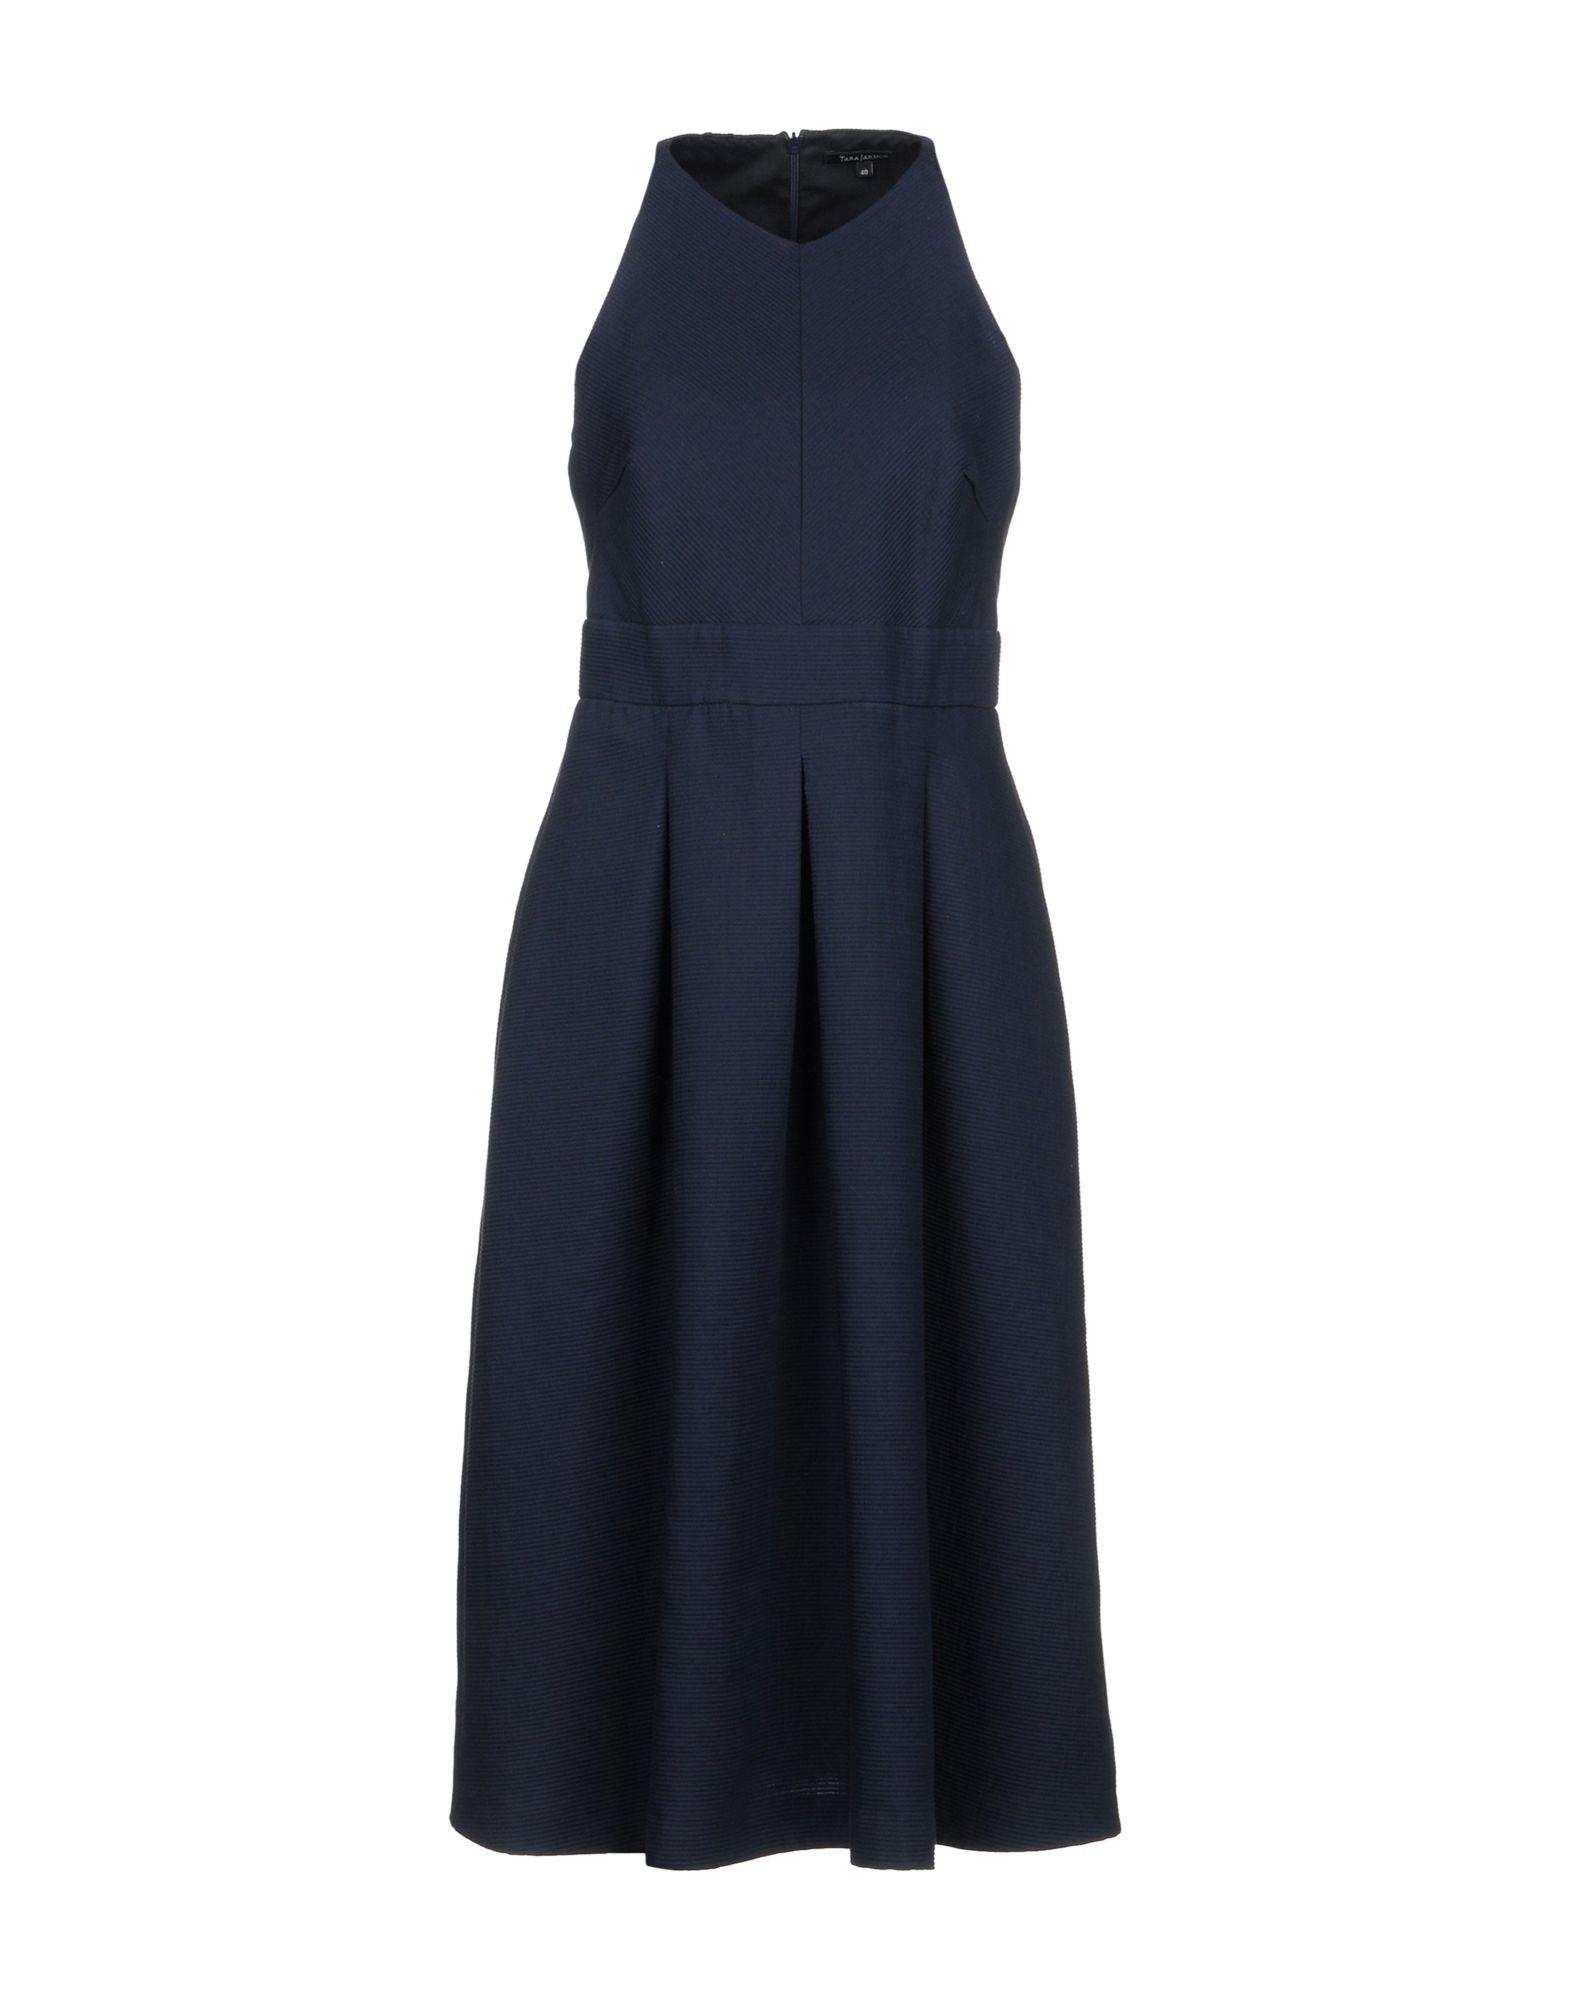 TARA JARMON Knee-Length Dress in Dark Blue